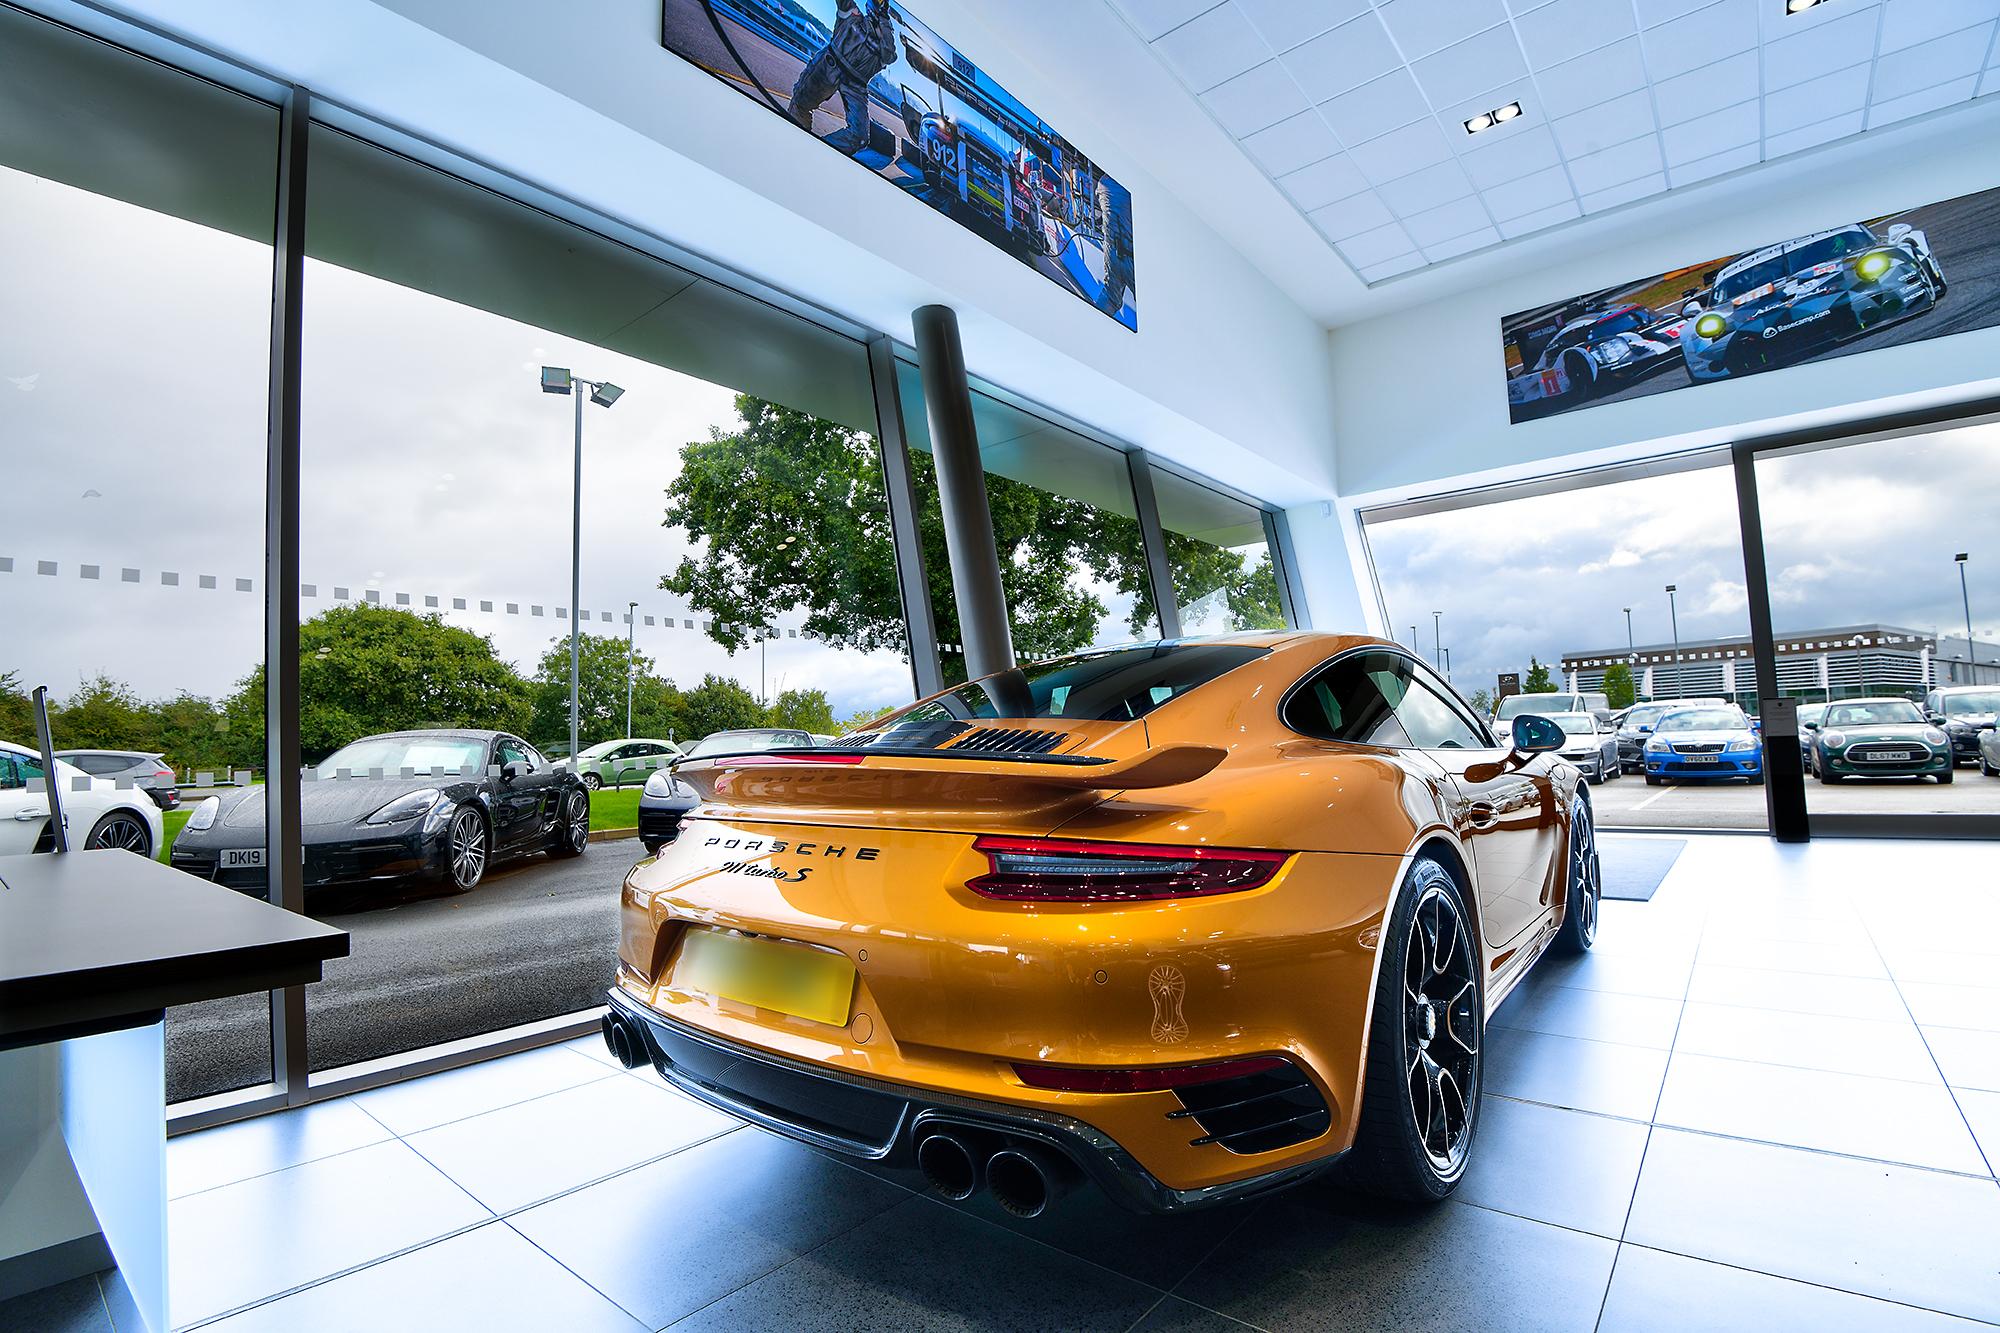 HDR photographic image - Porsche 5